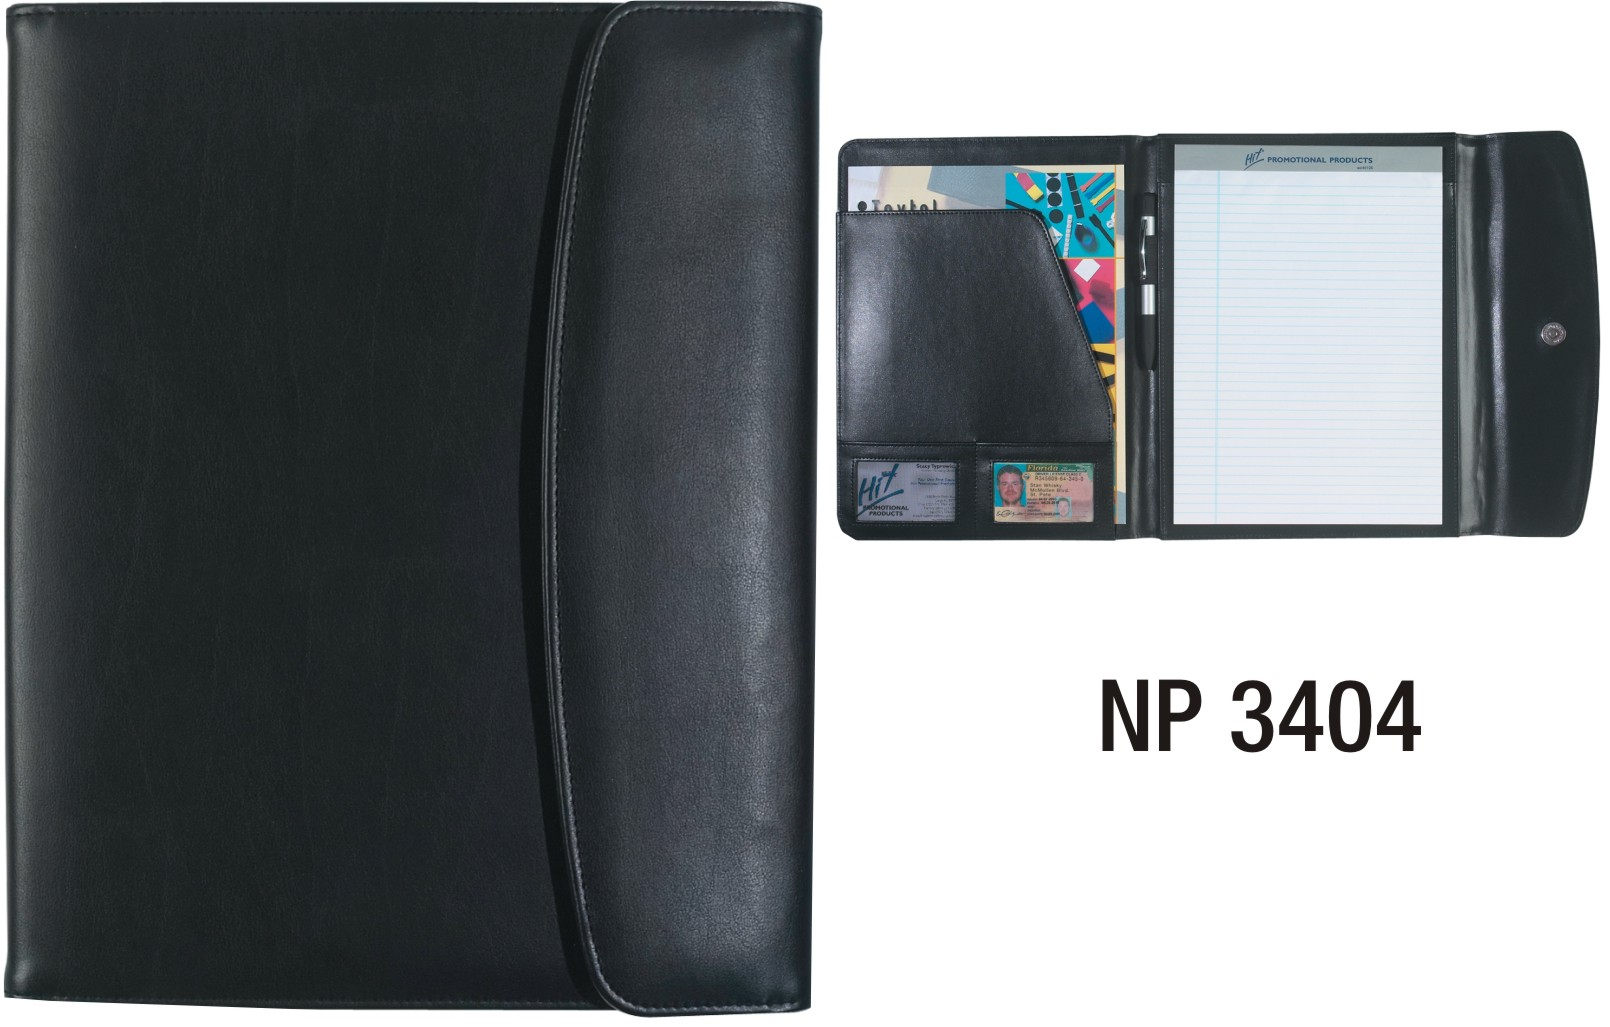 NP3404: Envelope Padfolio